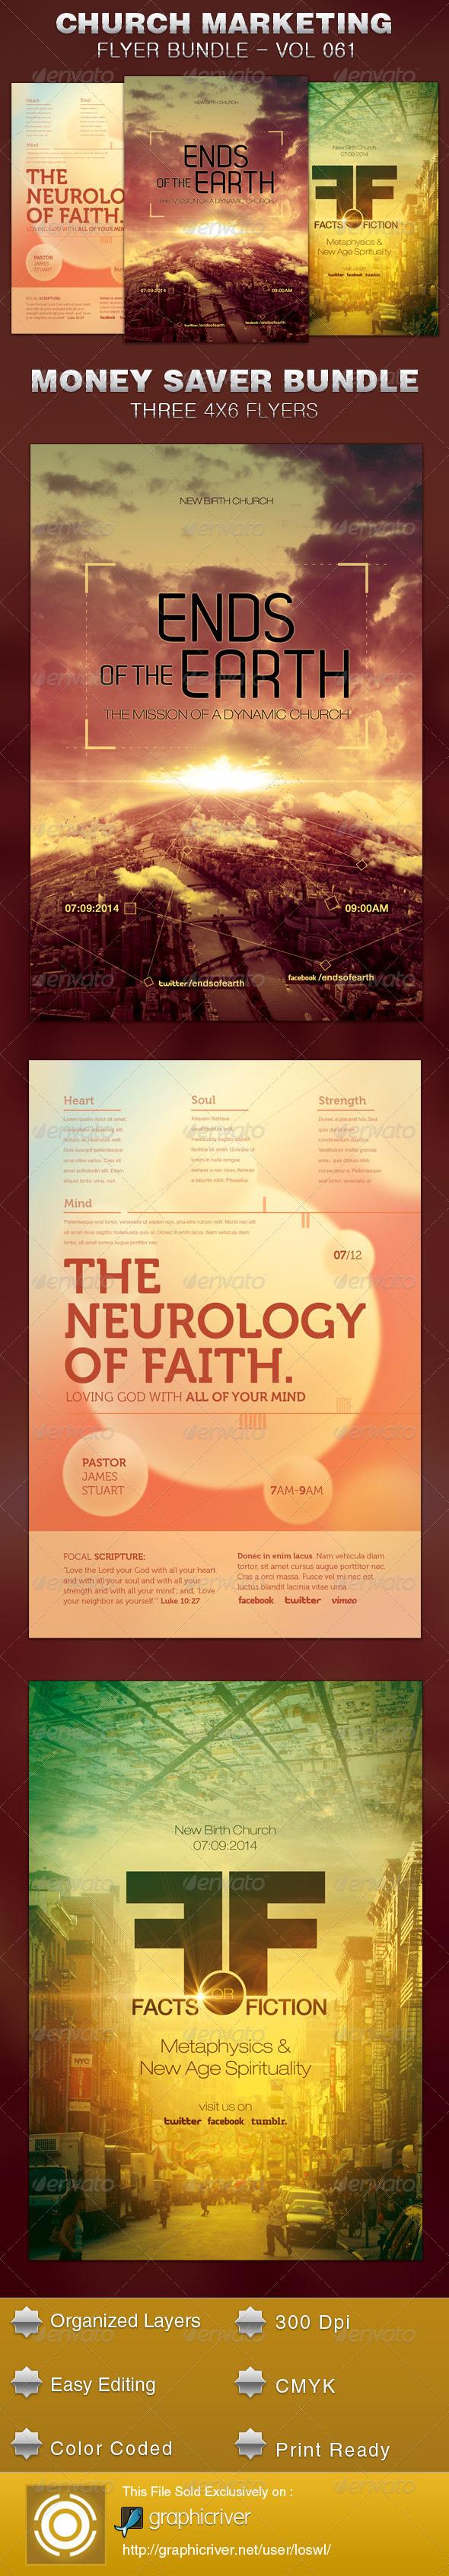 Church Marketing Flyer Template Bundle Vol 061